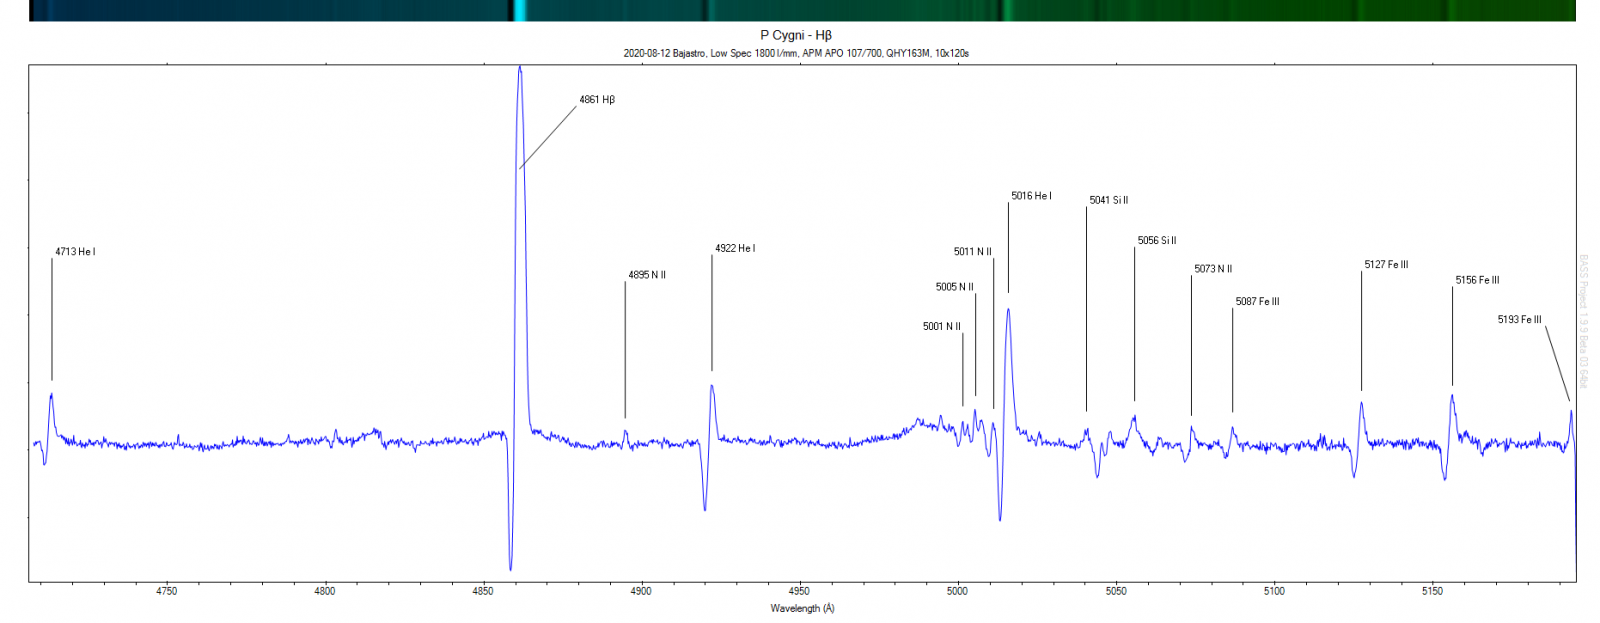 187597401_PCygniH-beta.thumb.PNG.71c78b1185ea0fef20723c65bcb93228.PNG